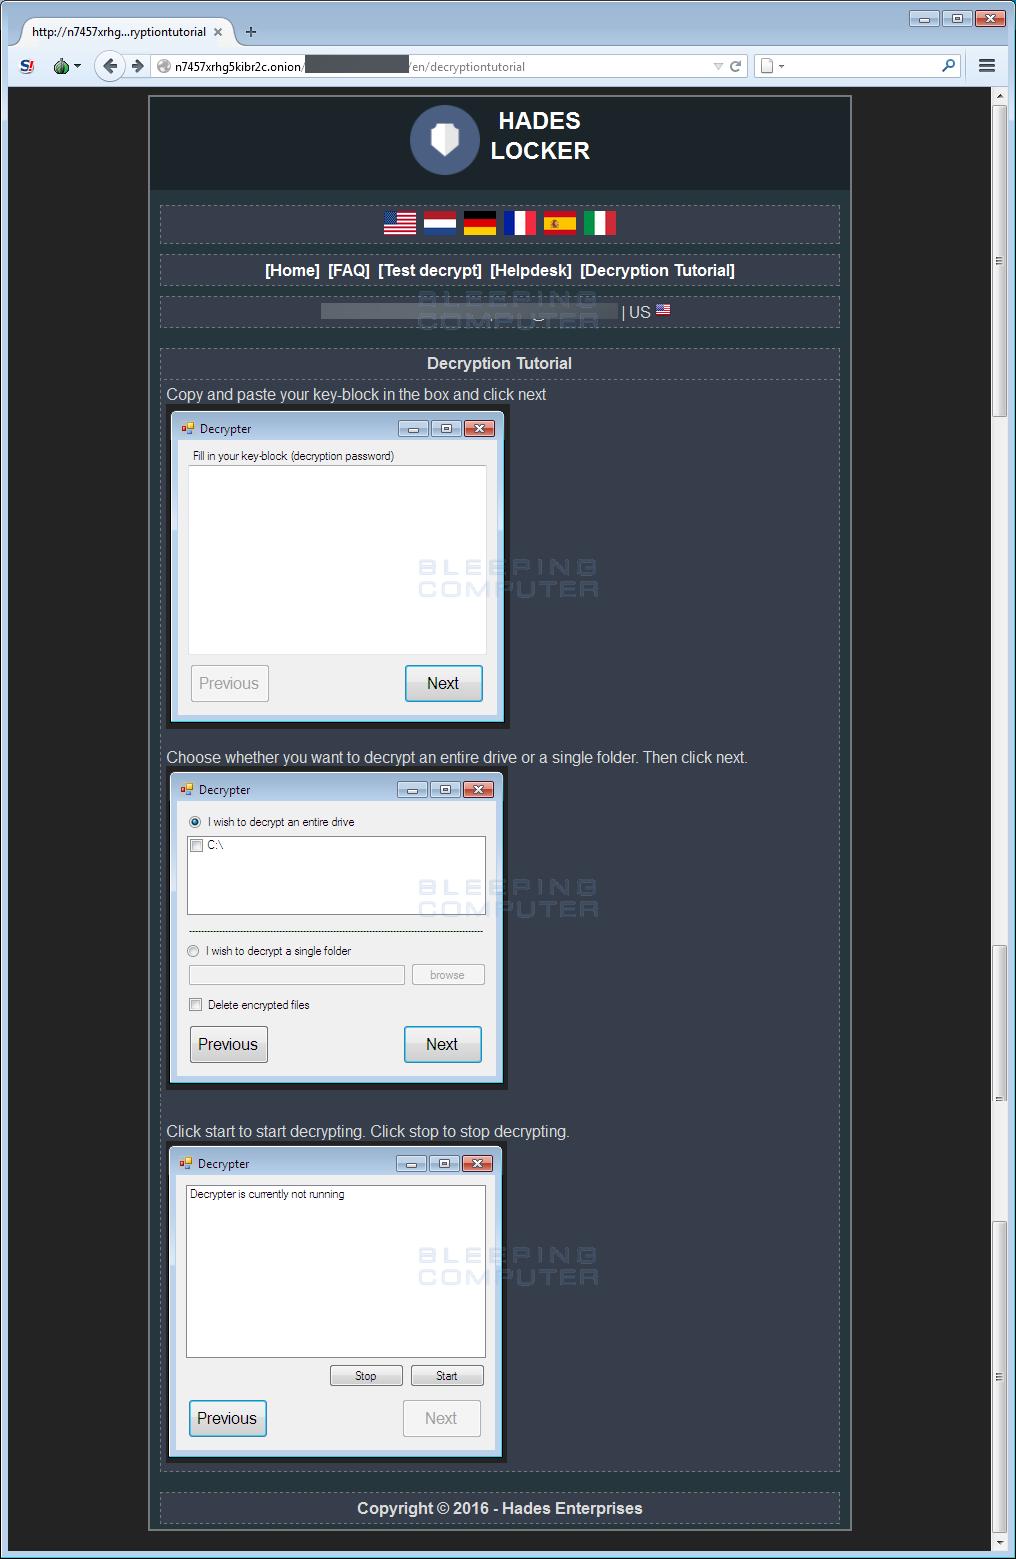 Decryption Tutorial Page